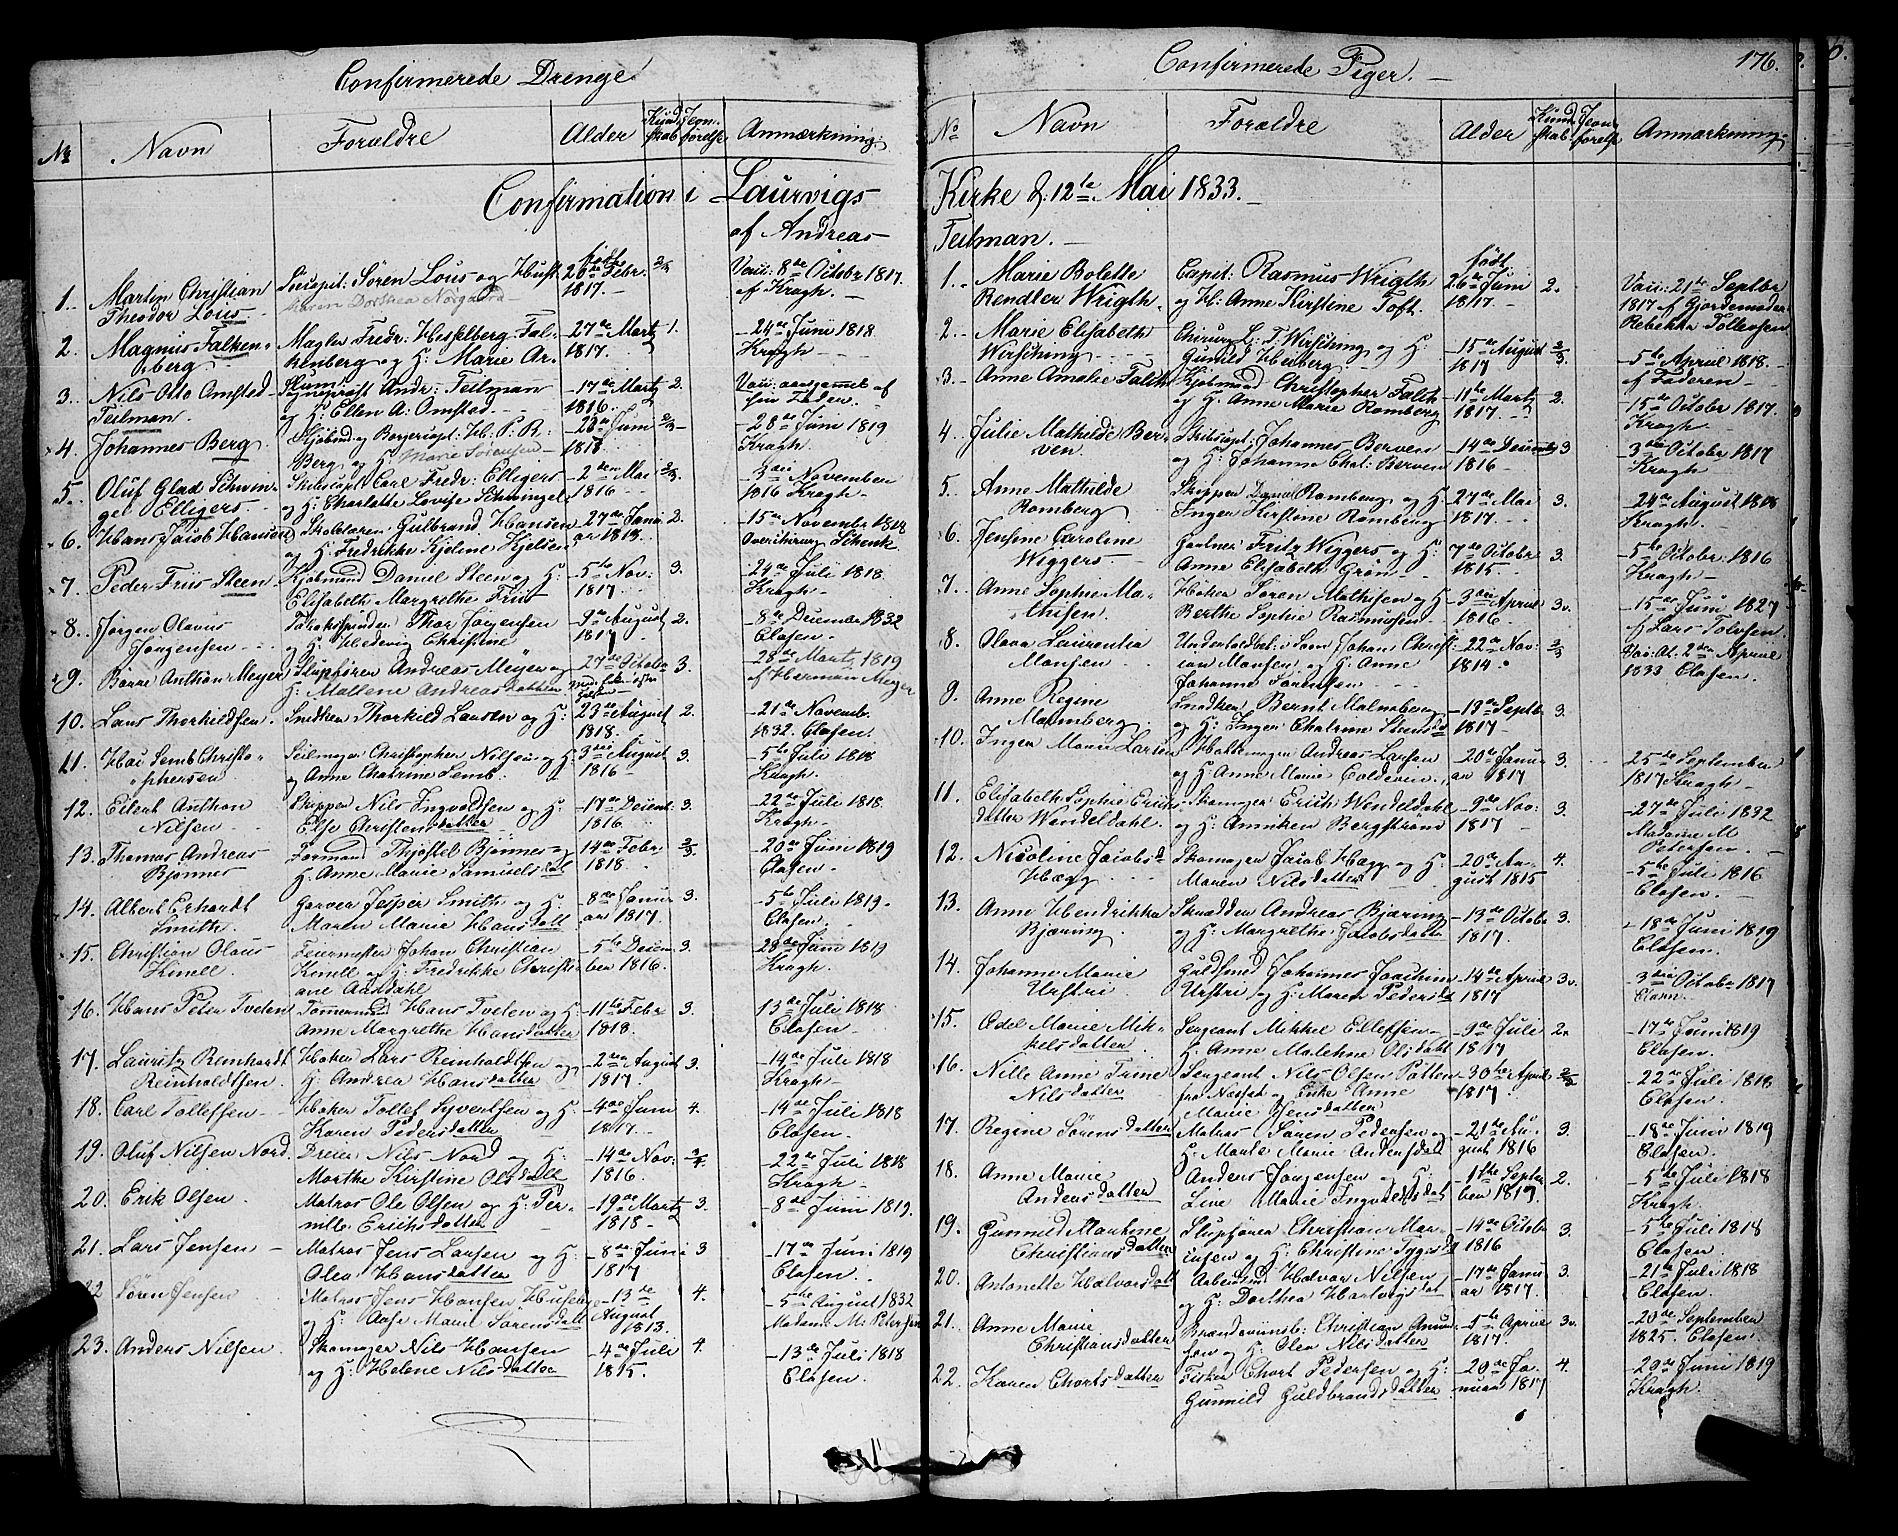 SAKO, Larvik kirkebøker, F/Fa/L0002: Ministerialbok nr. I 2, 1825-1847, s. 176